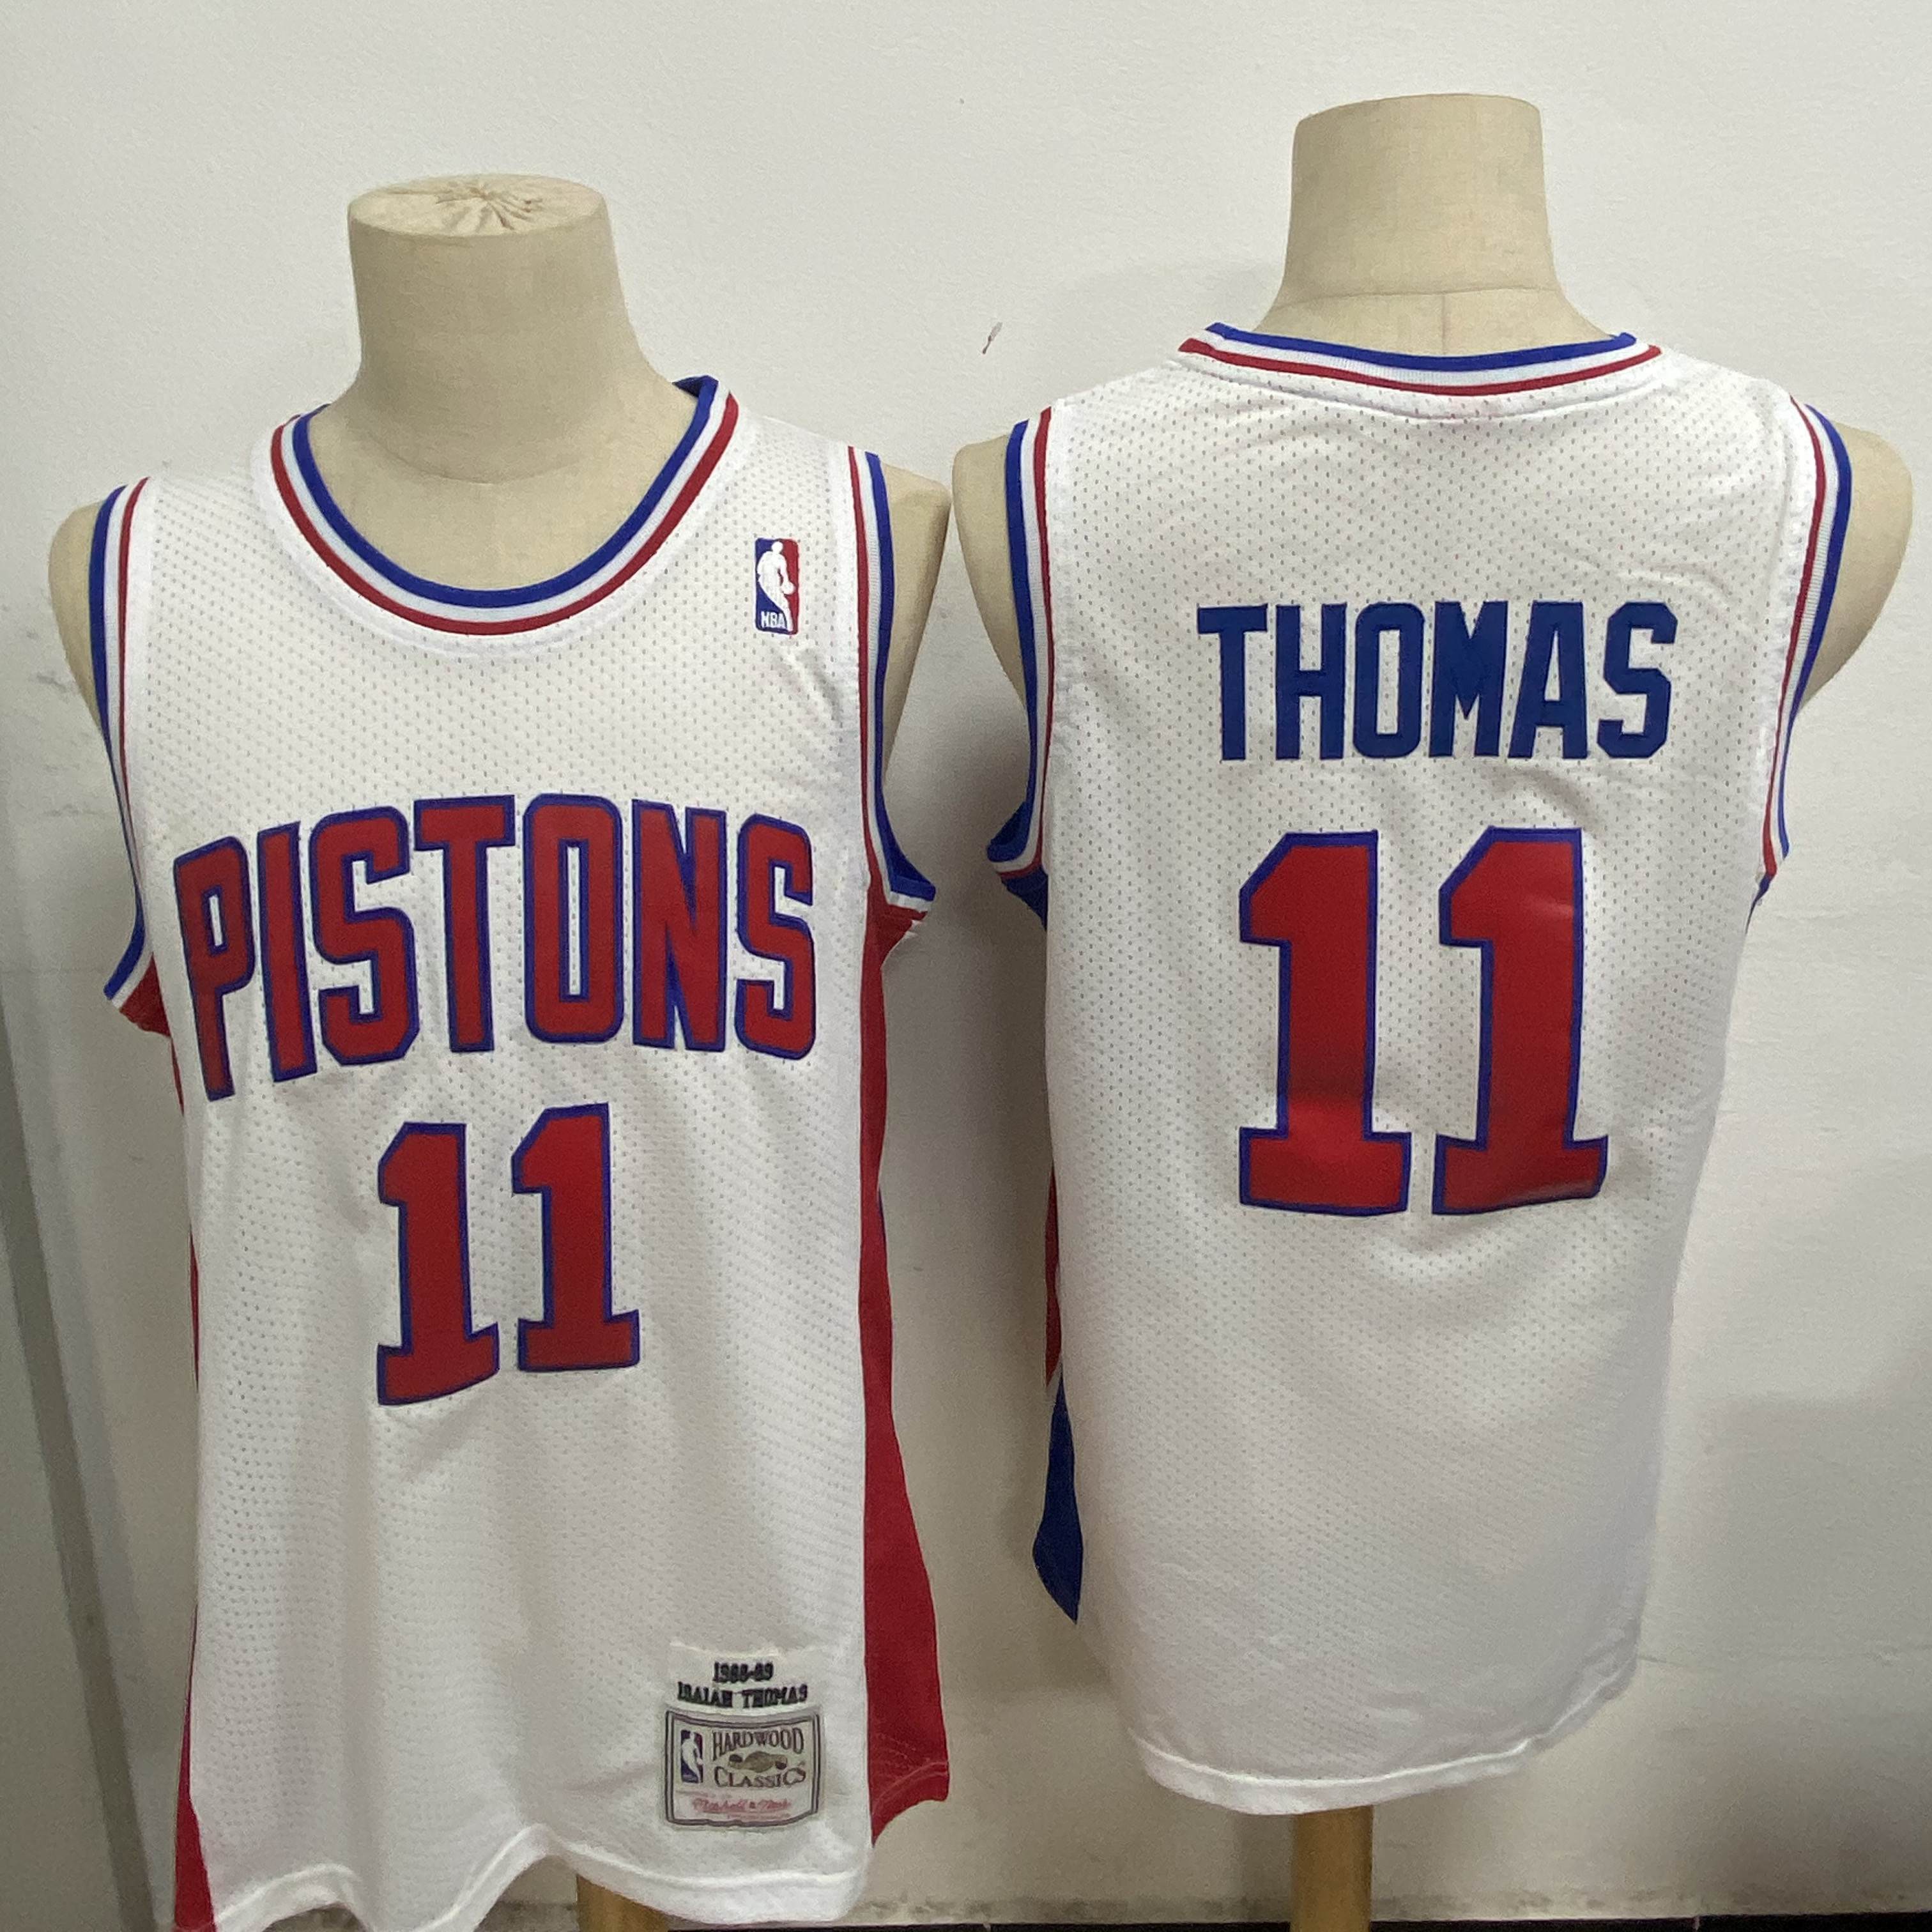 Pistons 11 Isiah Thomas White 1988-89 Hardwood Classics Jersey